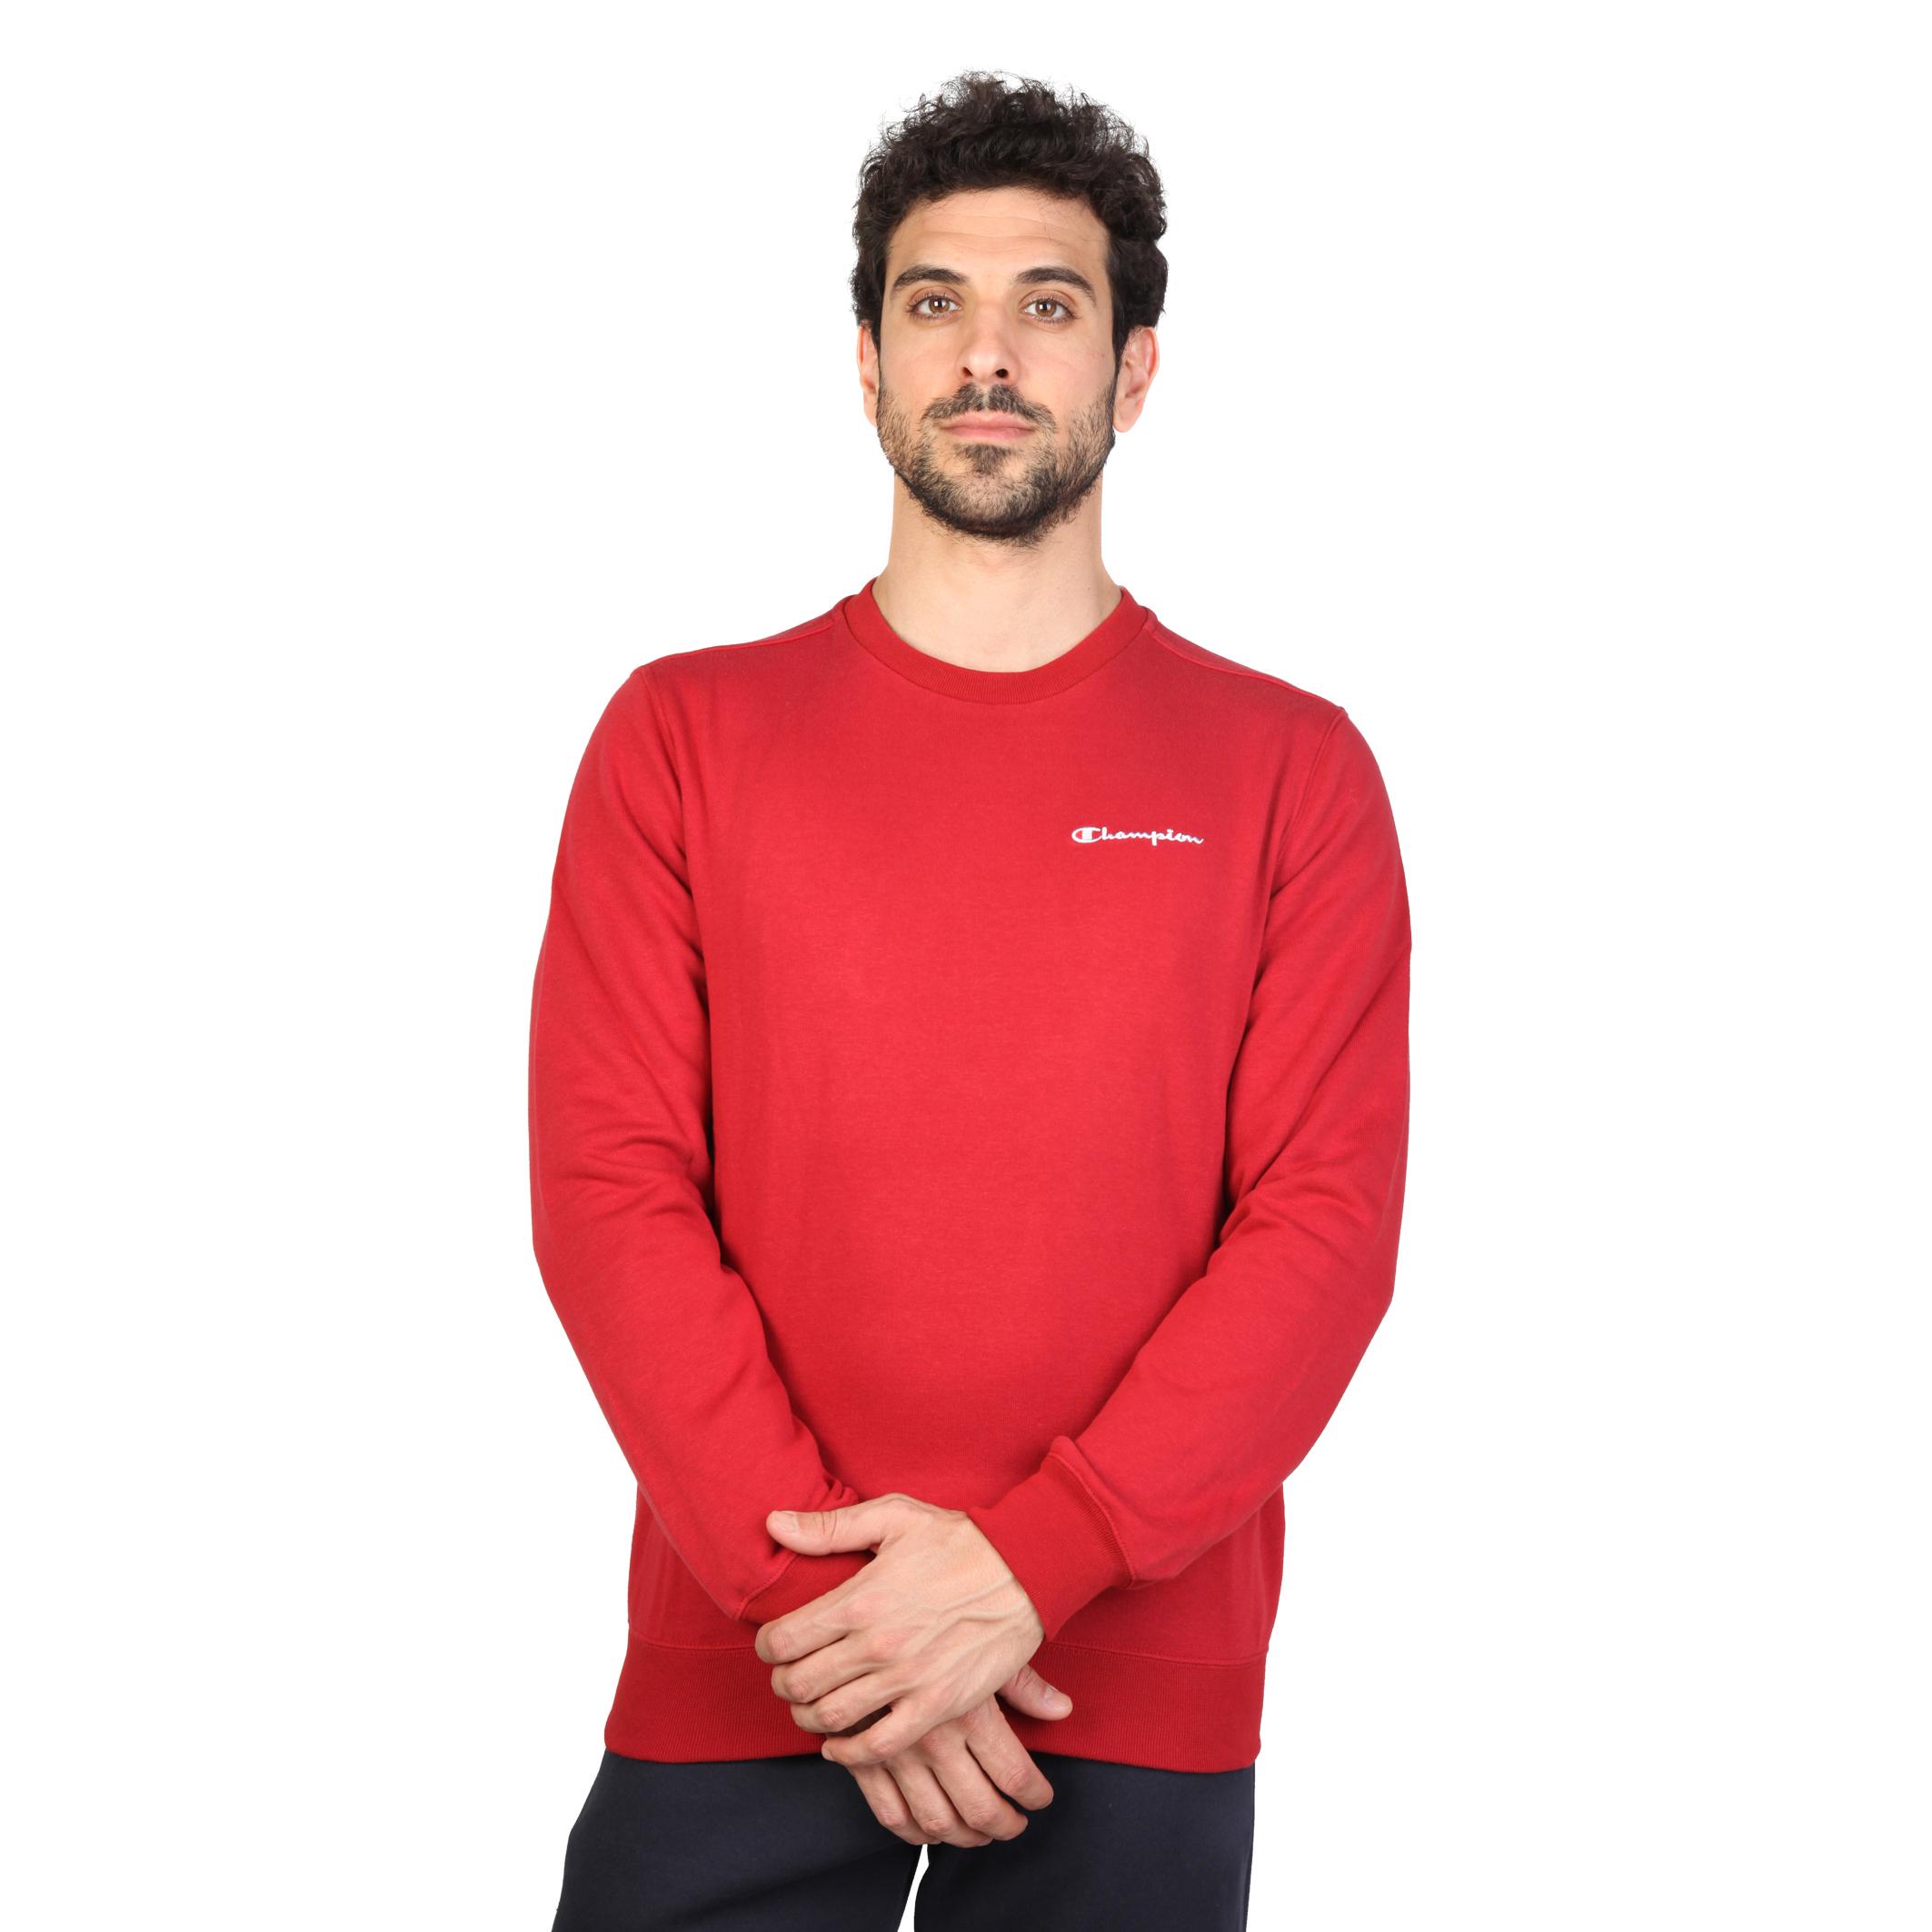 champion herren sweatshirt pullover mit gesticktem logo. Black Bedroom Furniture Sets. Home Design Ideas